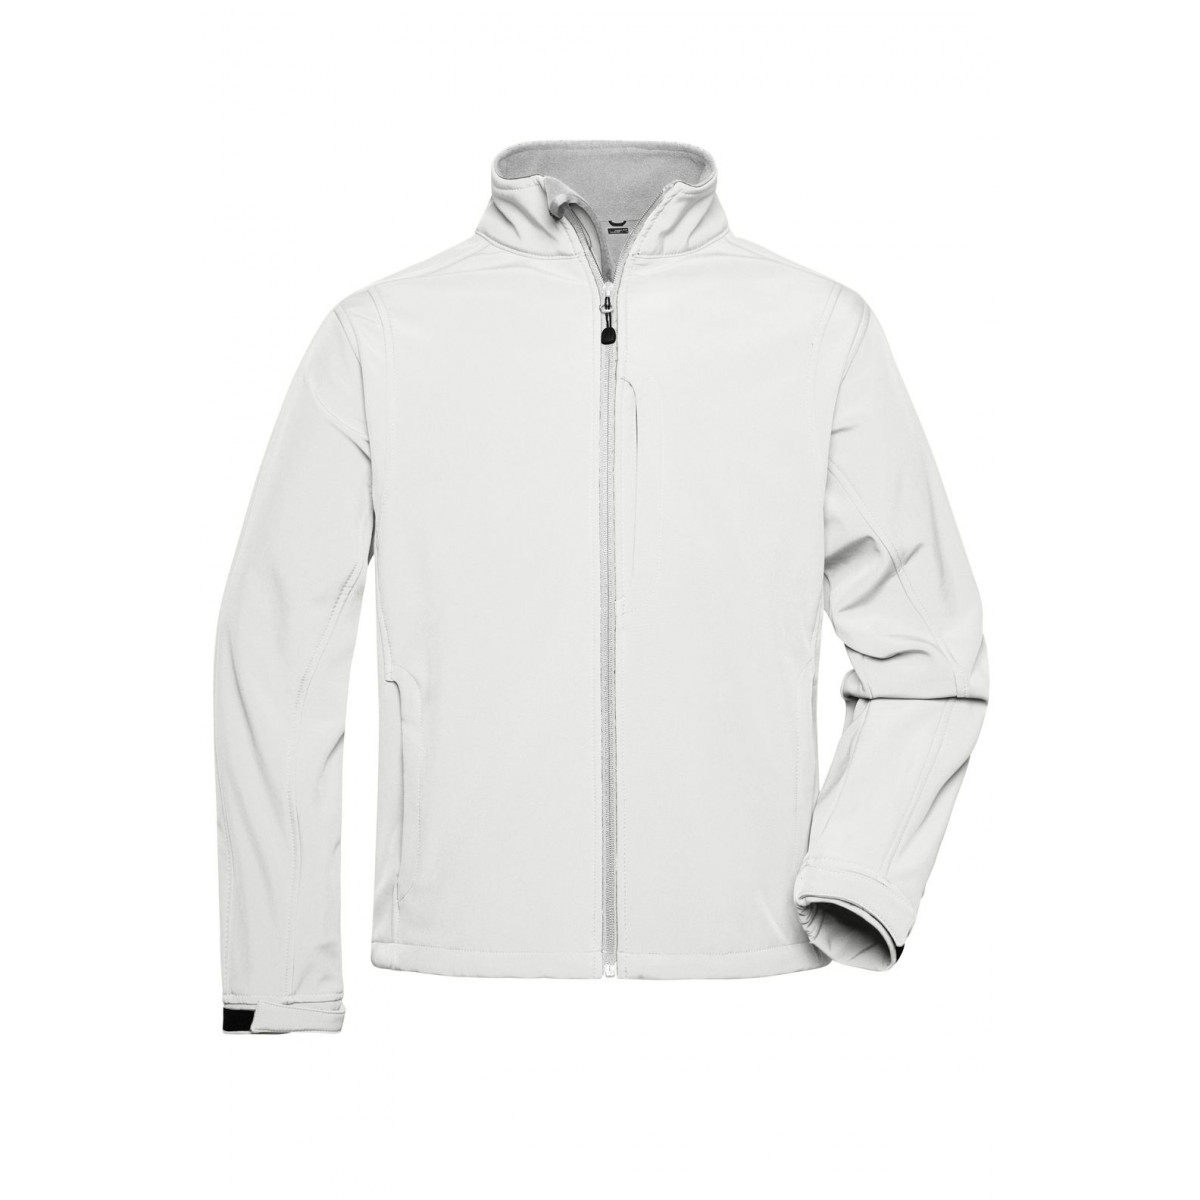 Куртка мужская JN135 Mens Softshell Jacket - Белый